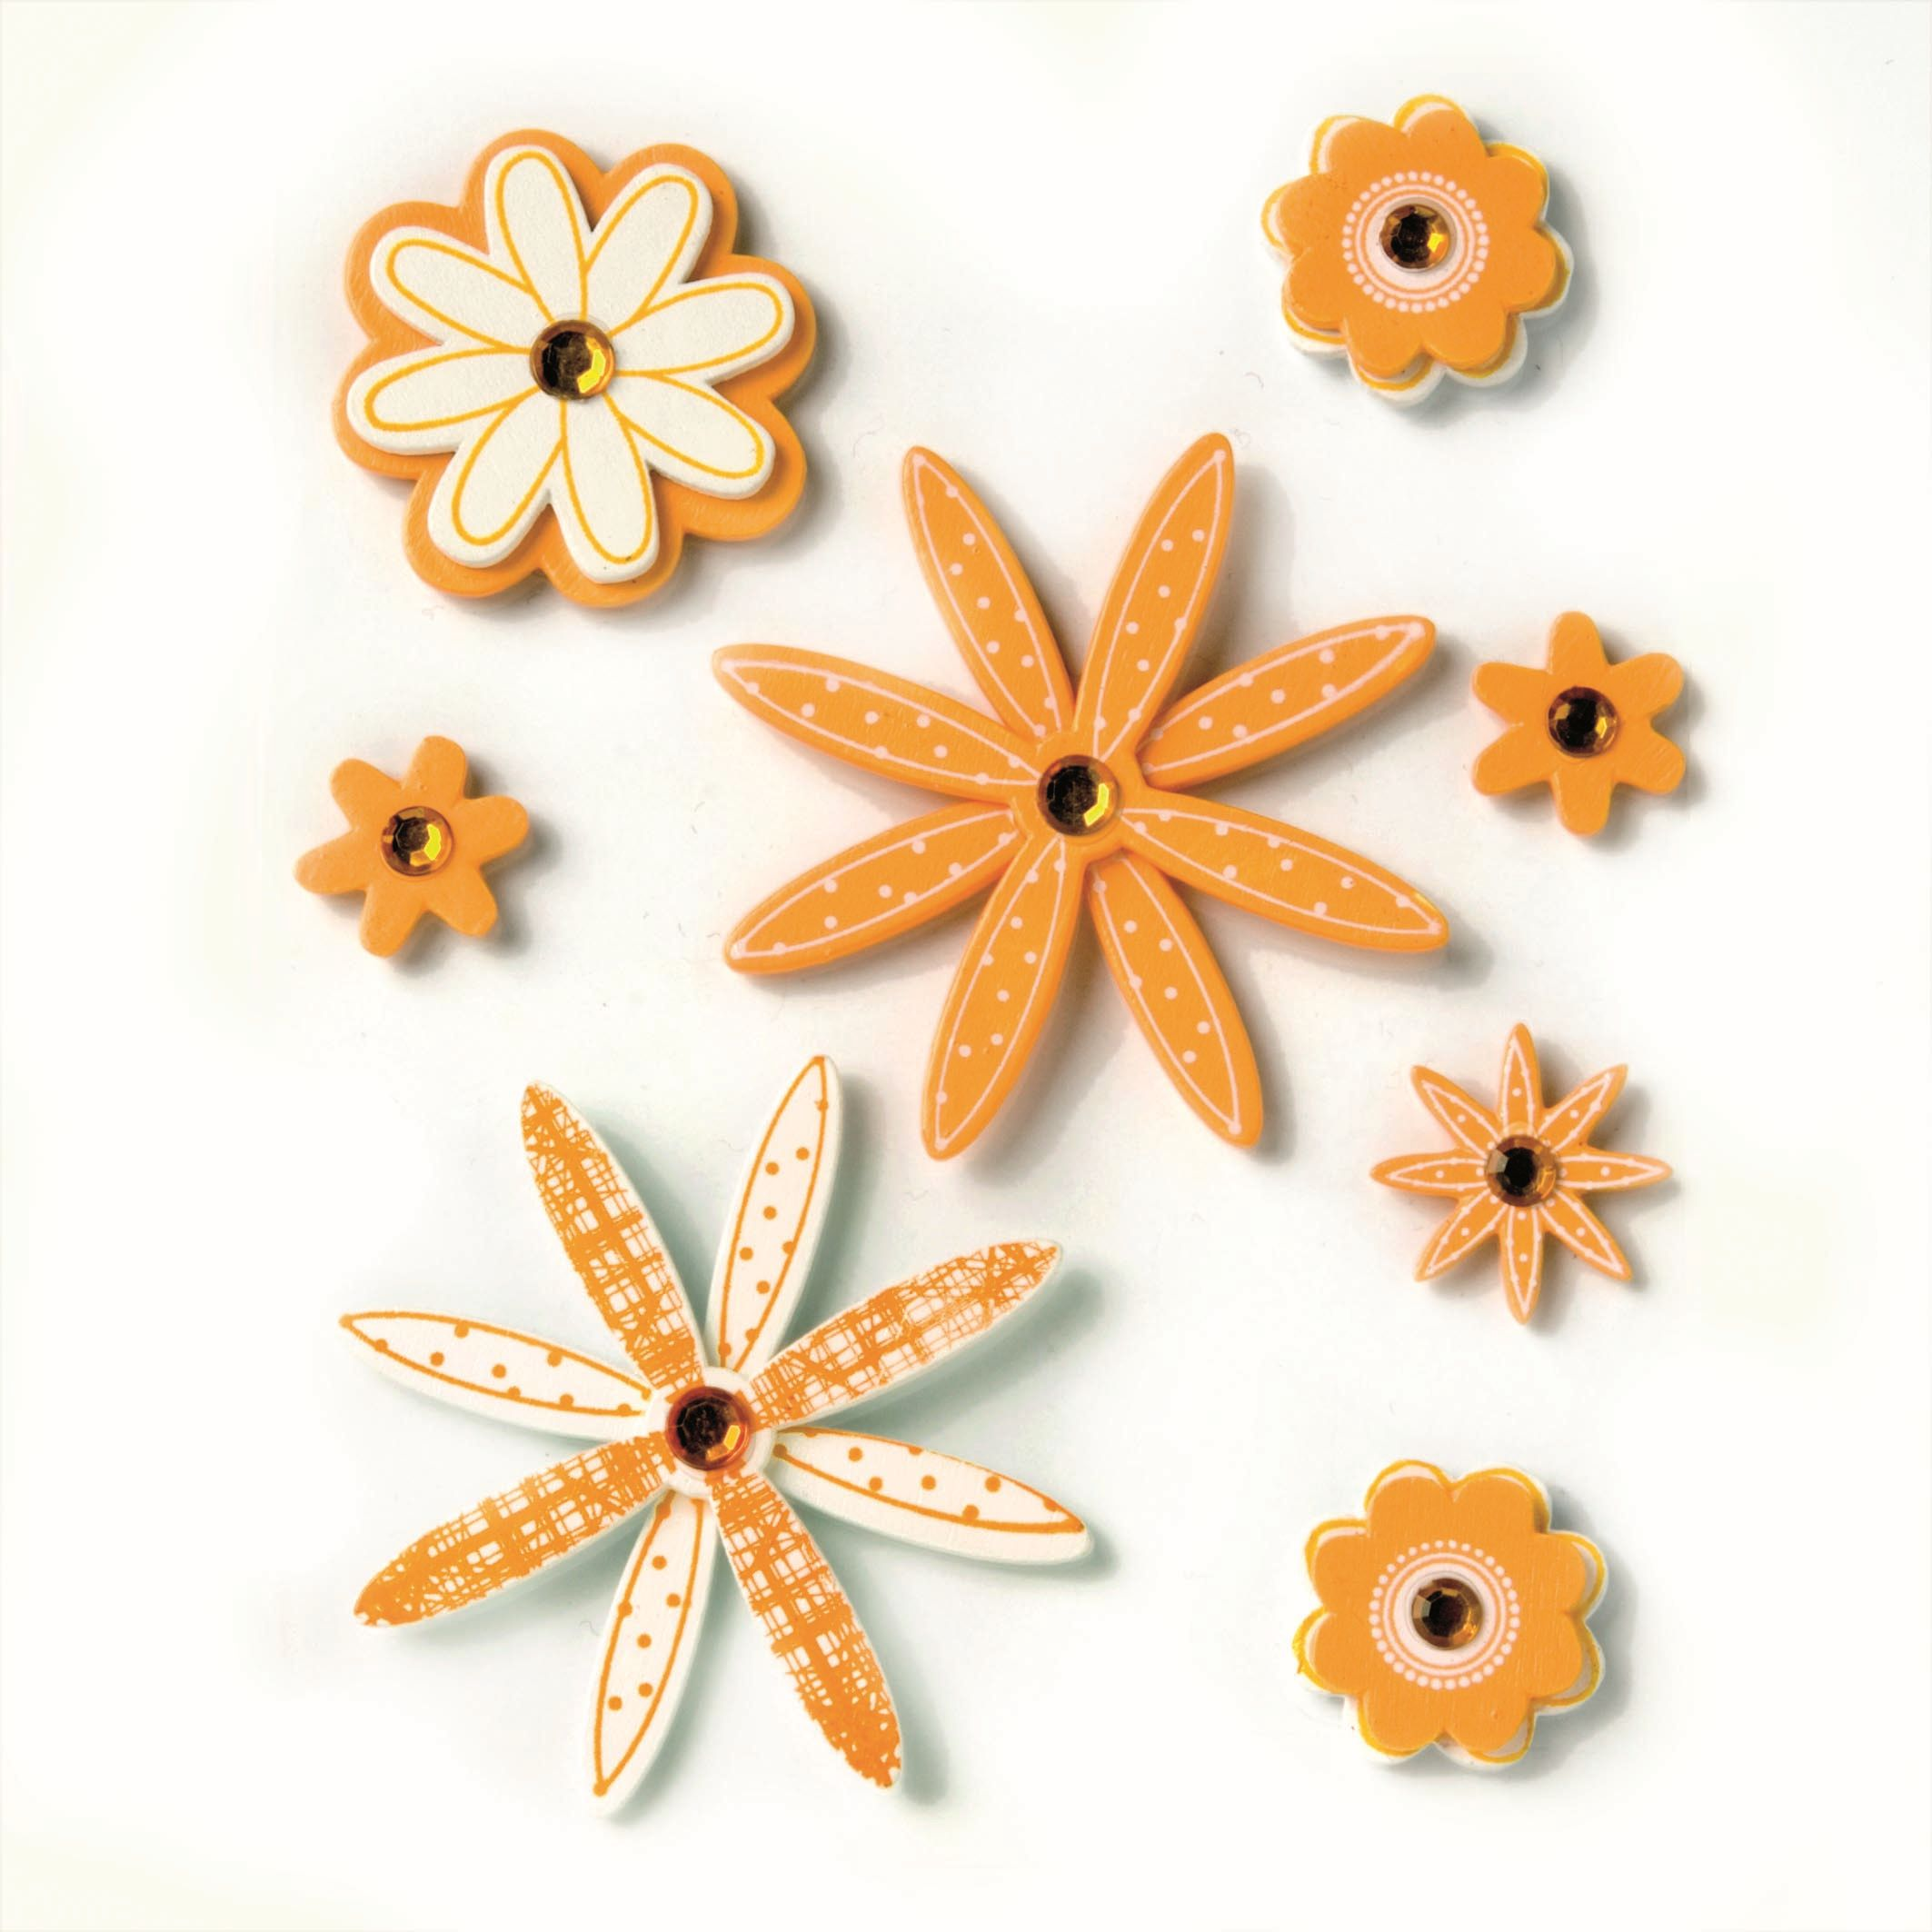 61710029 Фигурки из дерева Цветок 8шт оранжевый Glorex